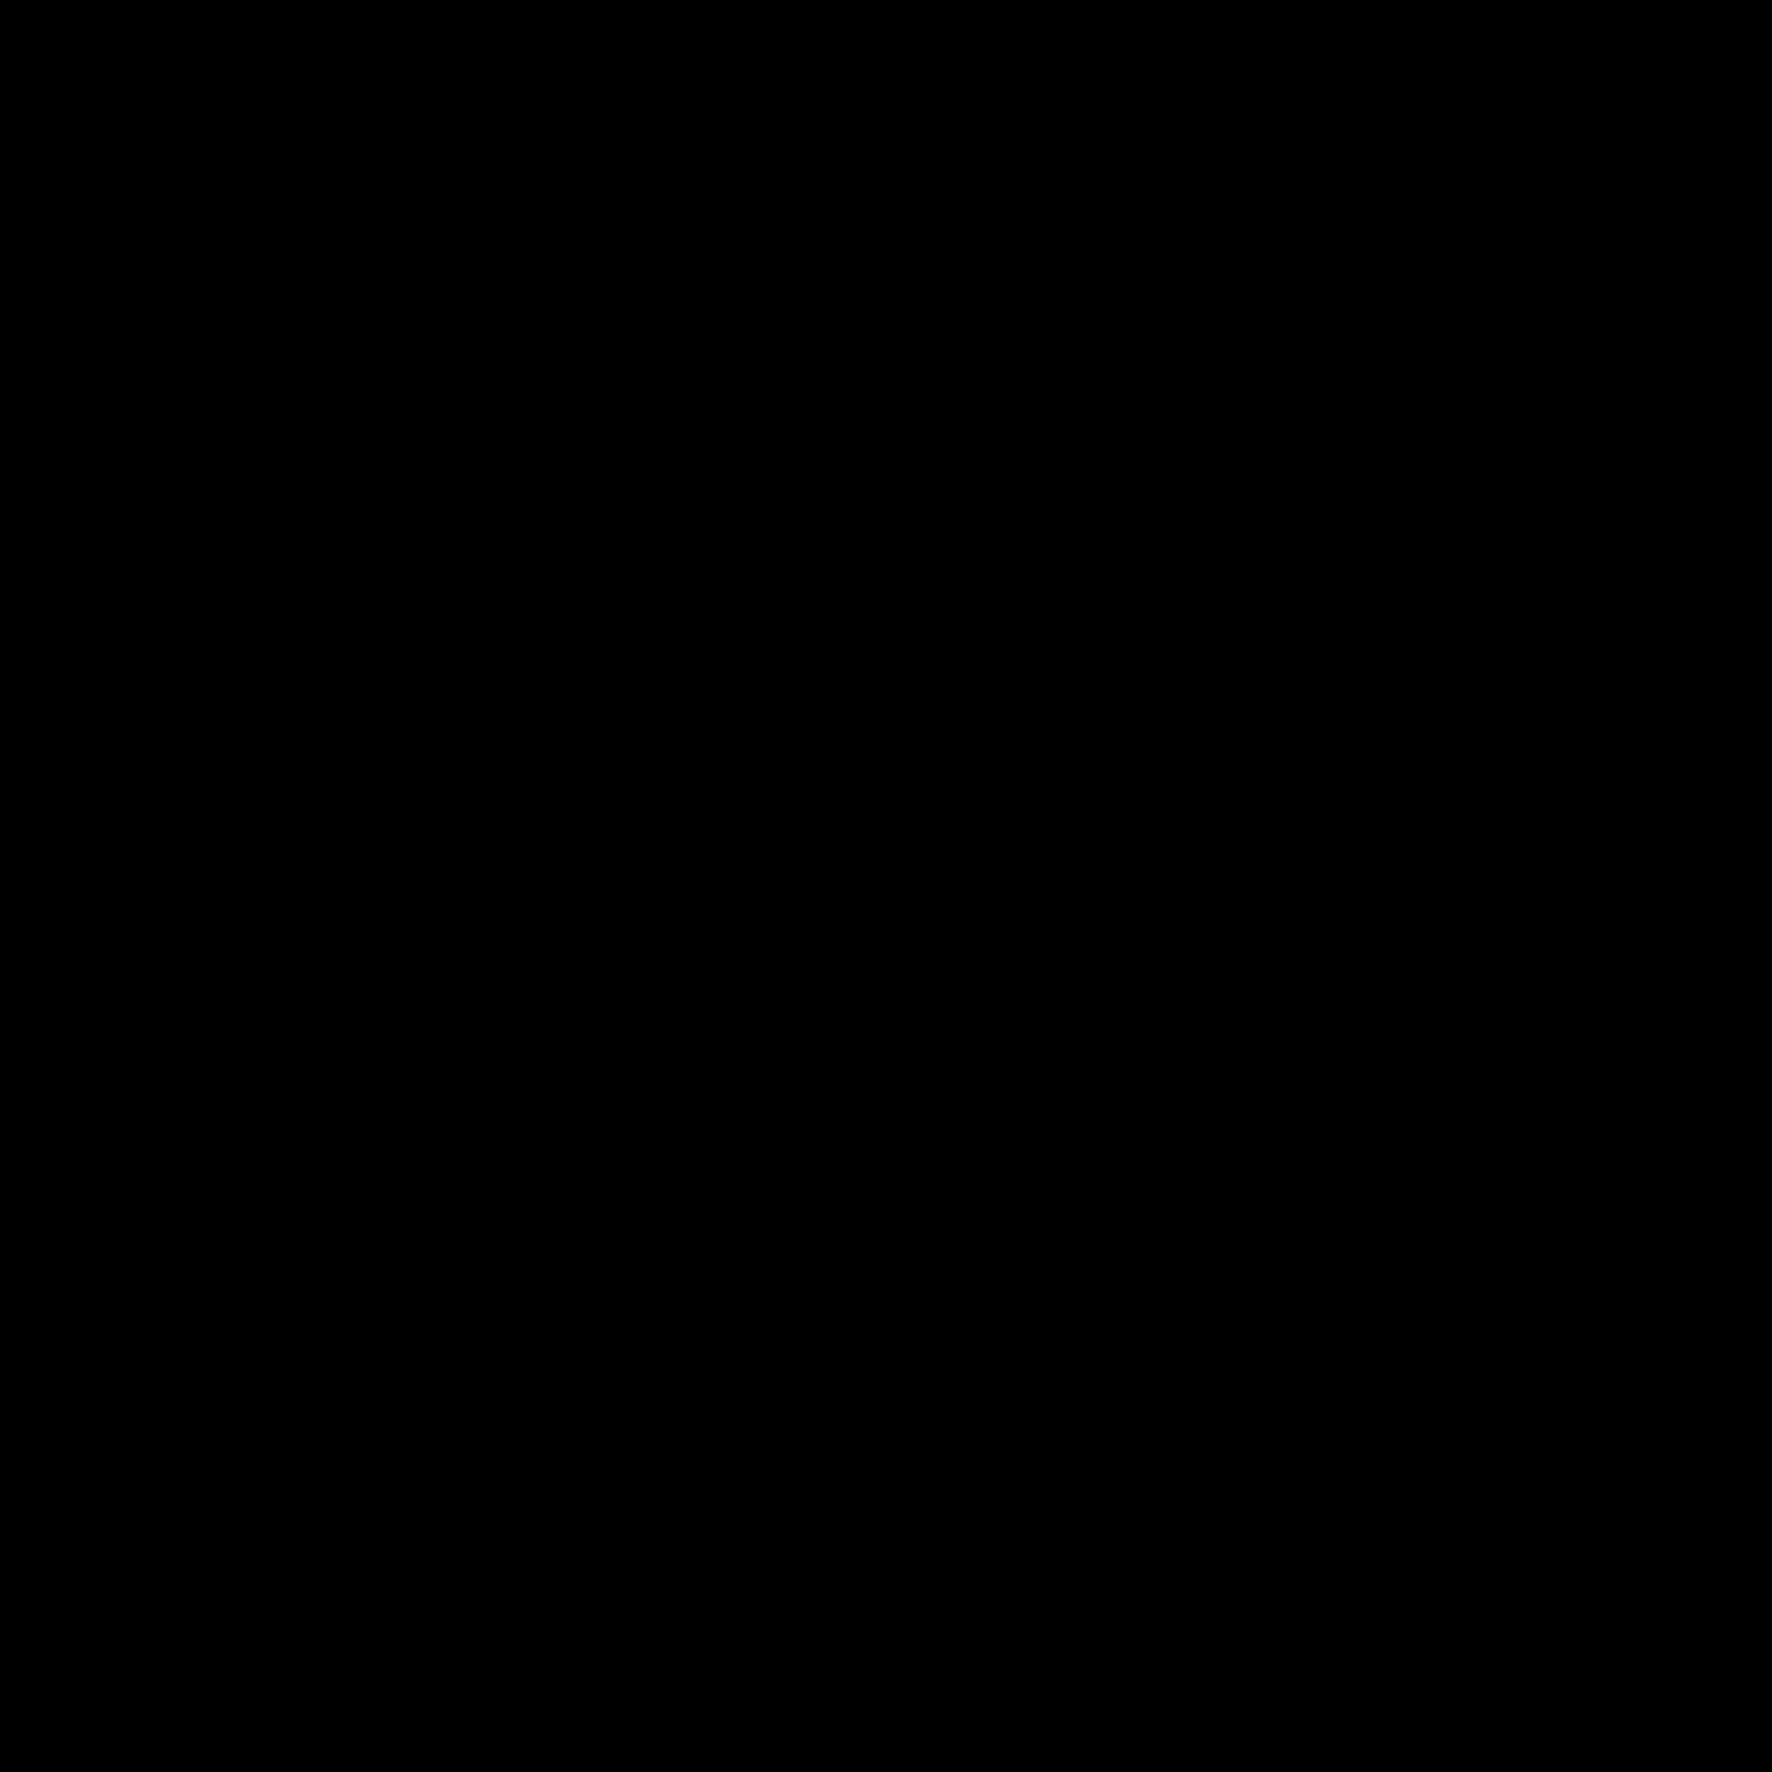 christian-rieke